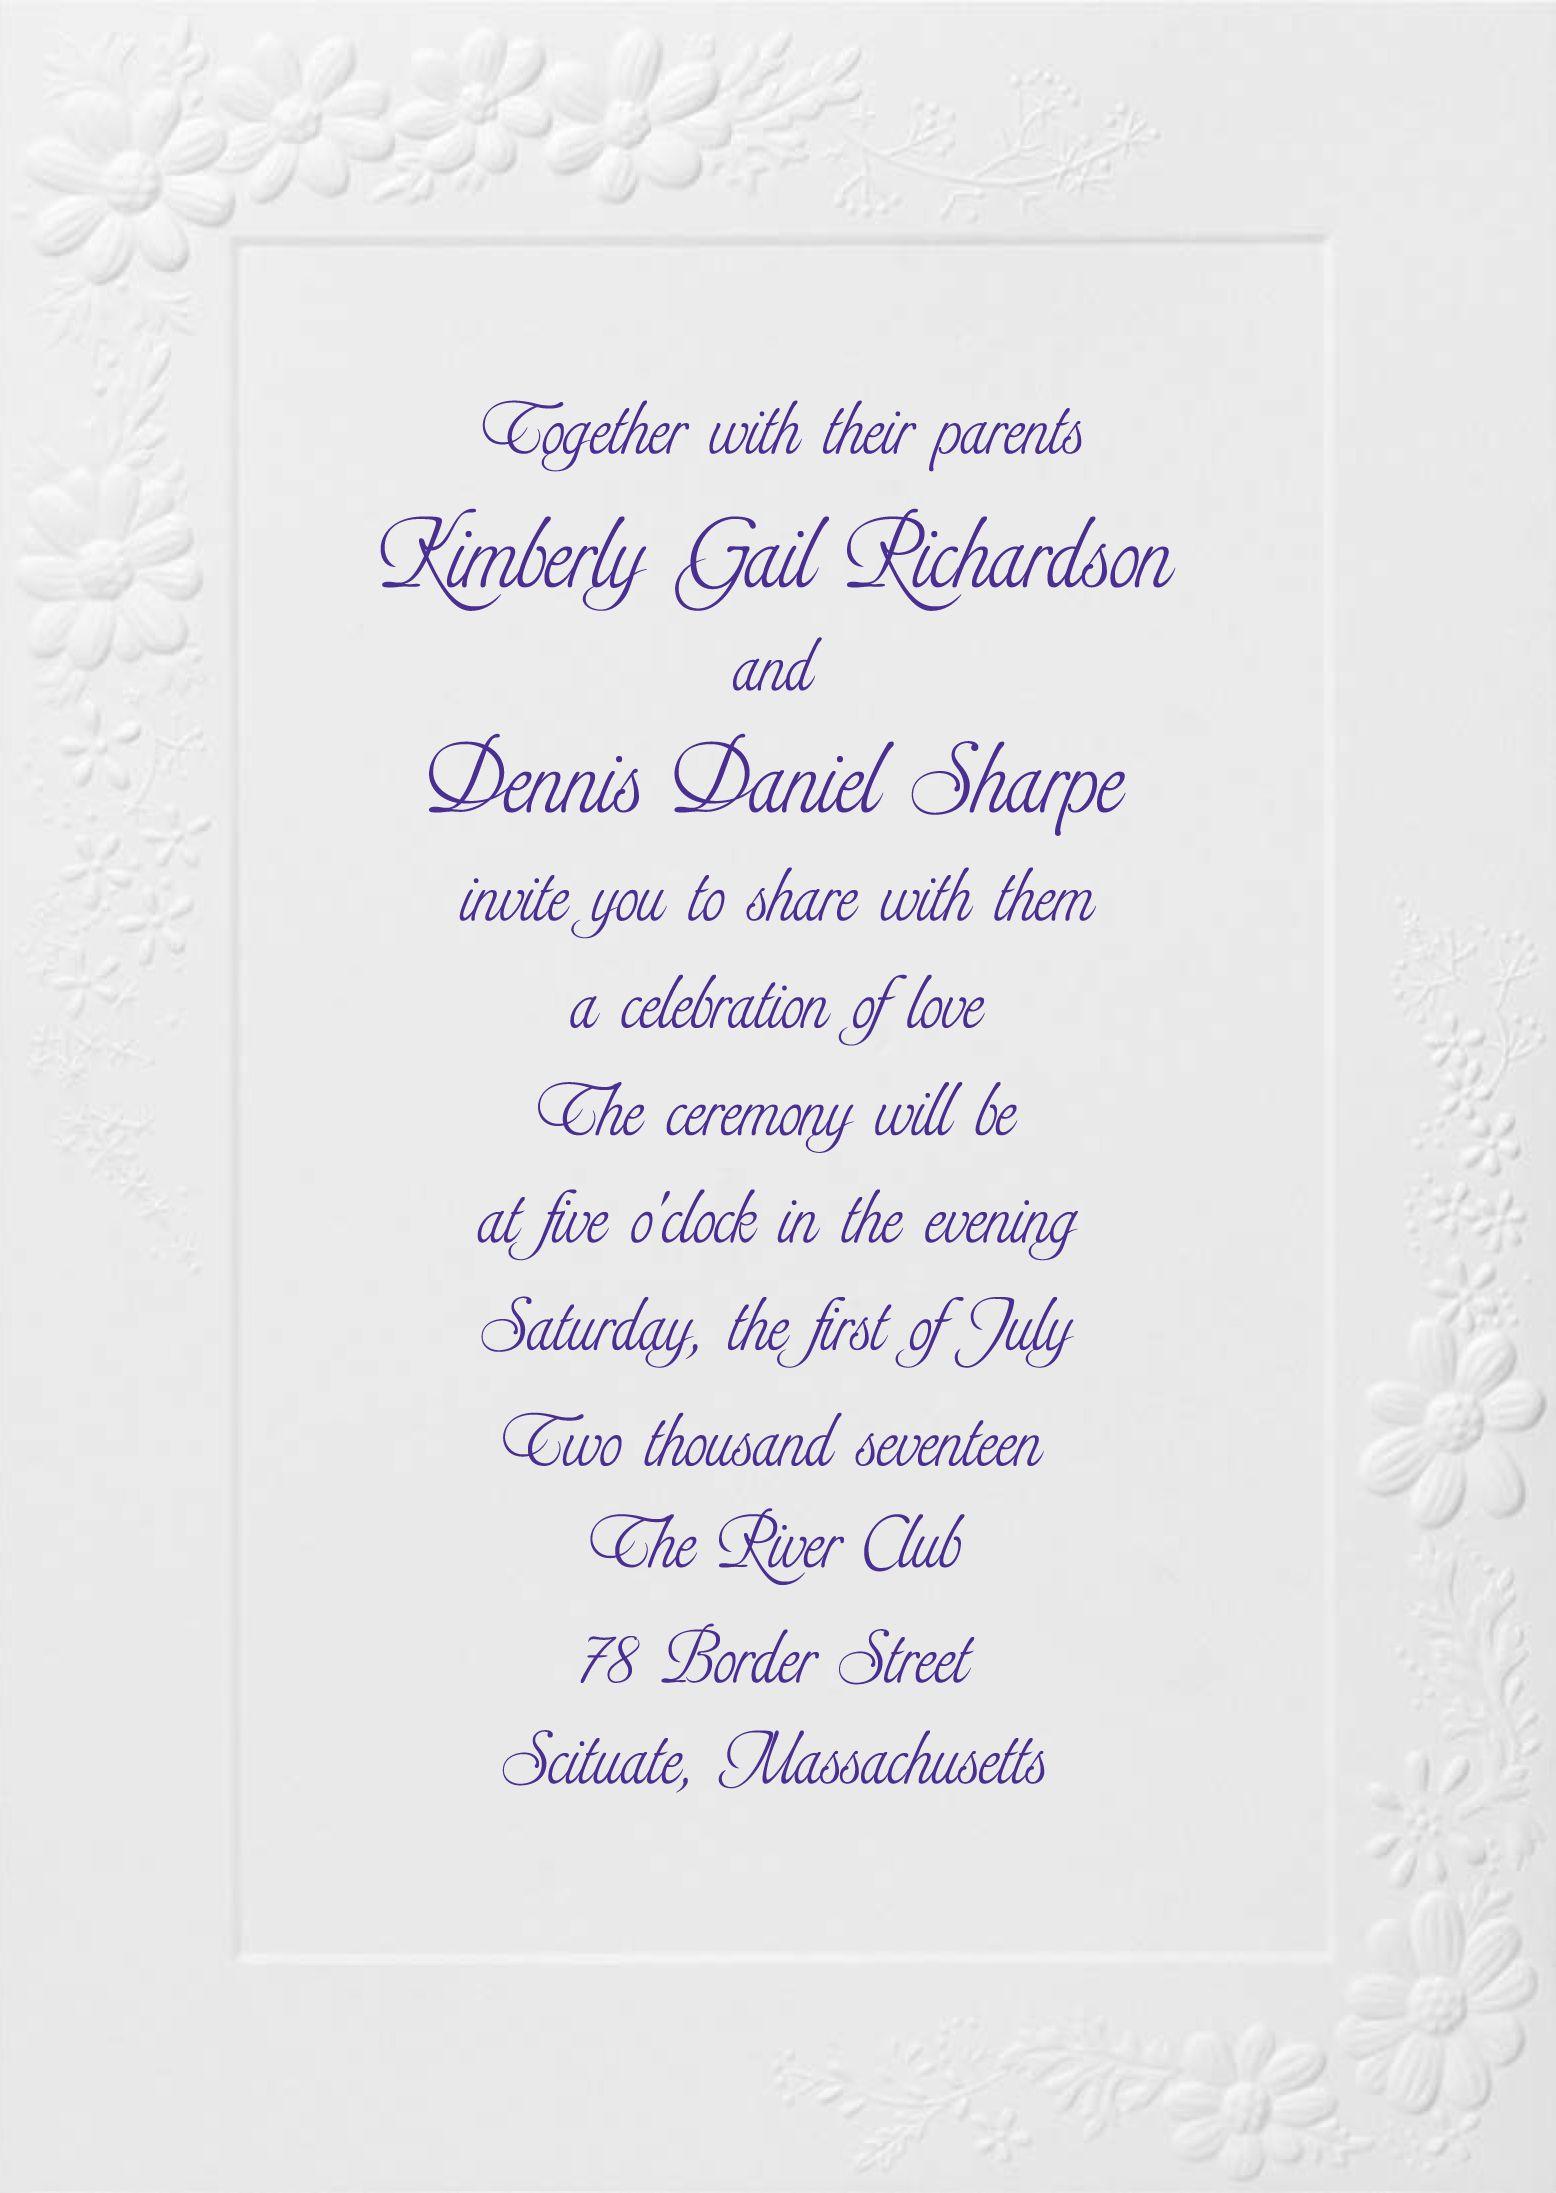 Birchcraft Wedding Invitations.Birchcraft Wedding Invitation With Floral Border Catalog